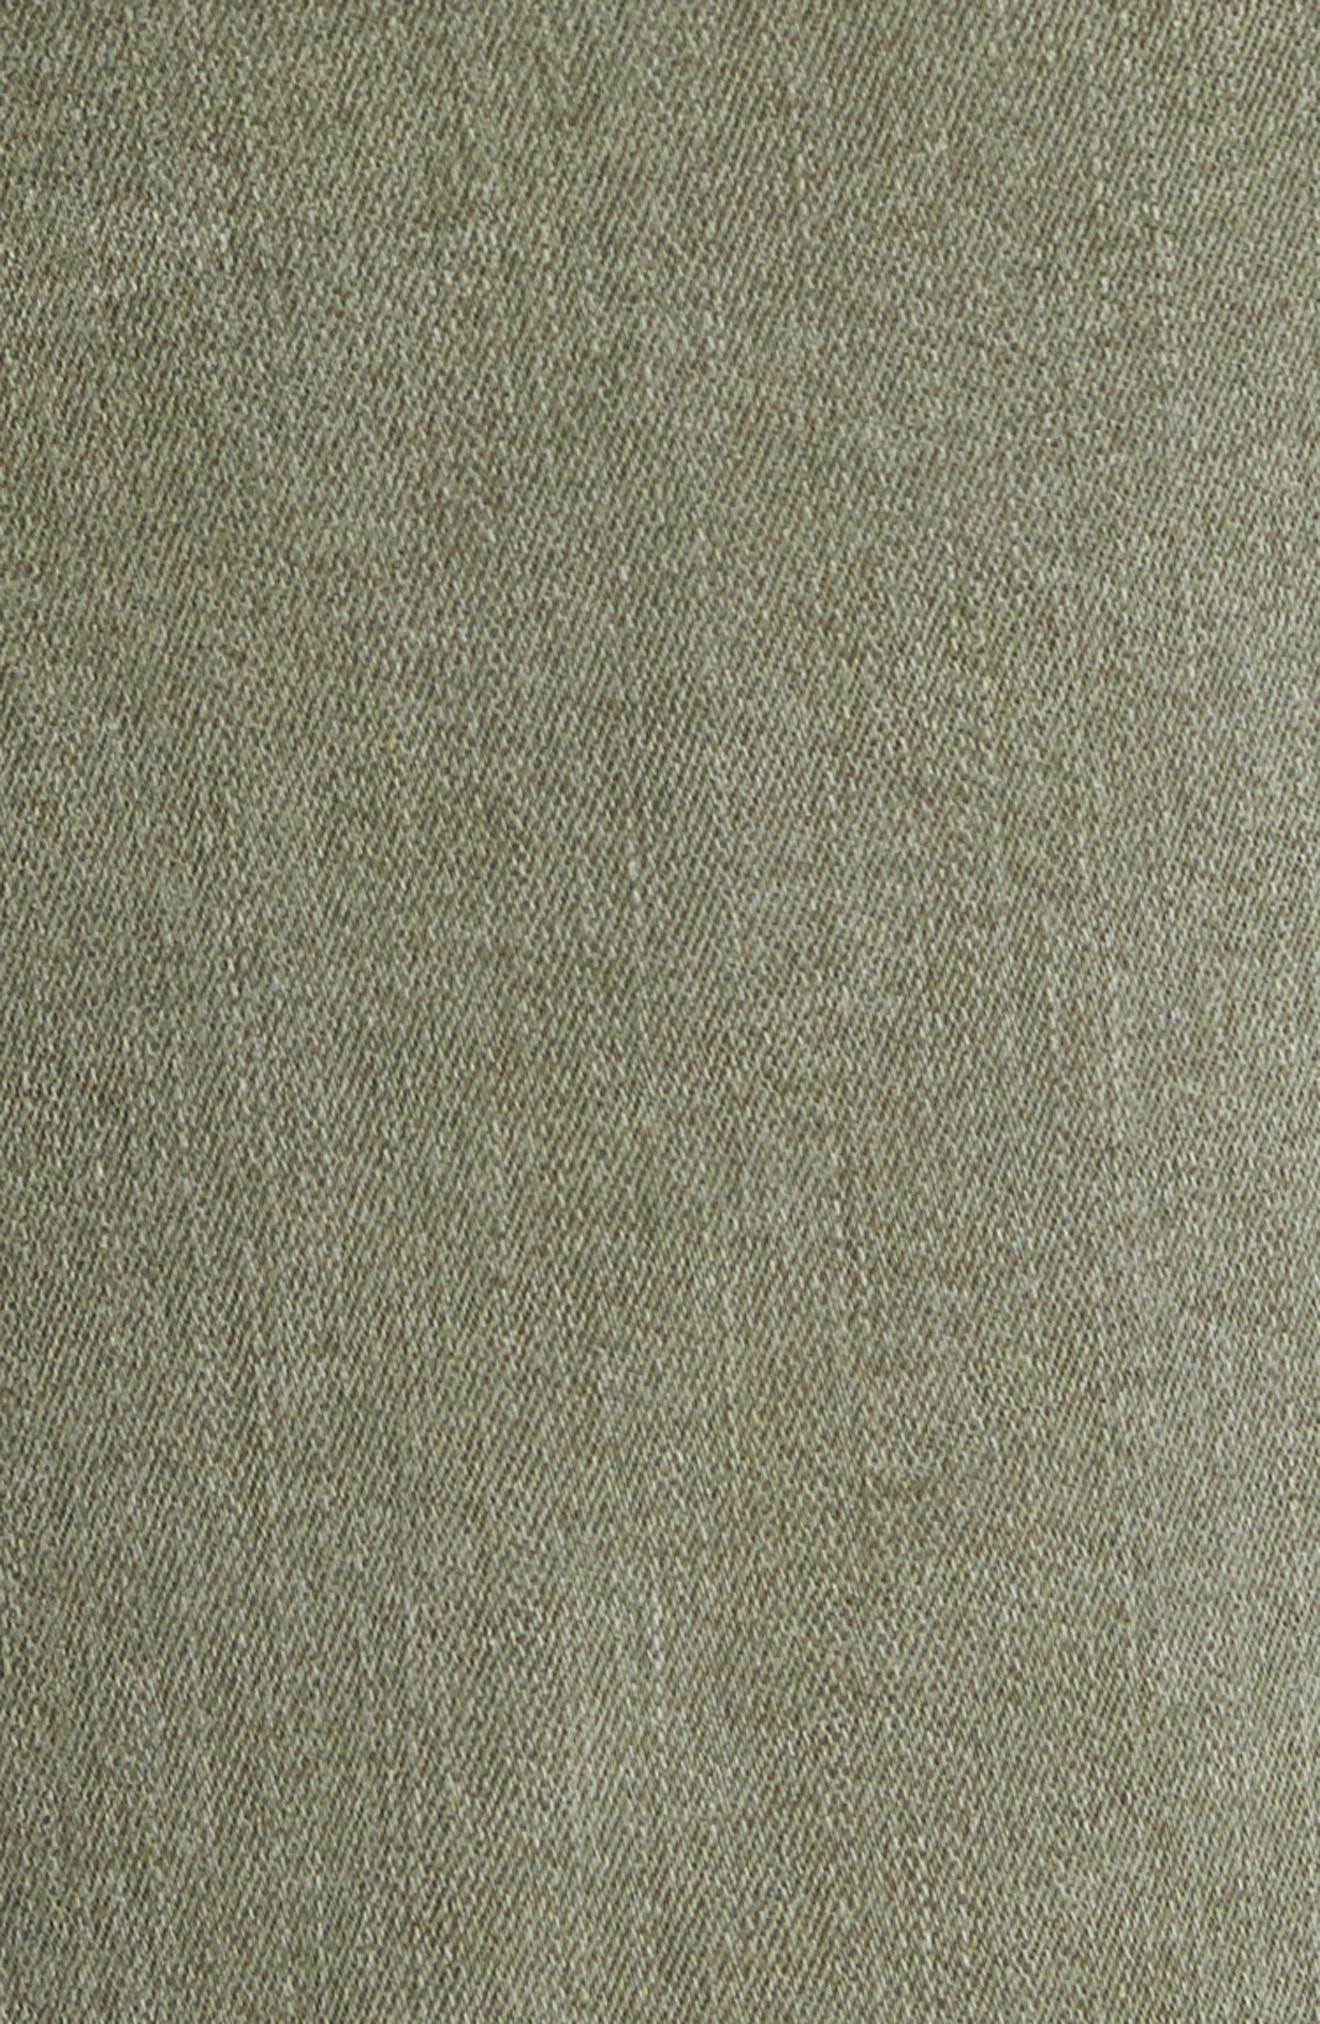 Alternate Image 6  - NYDJ Ami Frayed Hem Stretch Skinny Ankle Jeans (Regular & Petite)